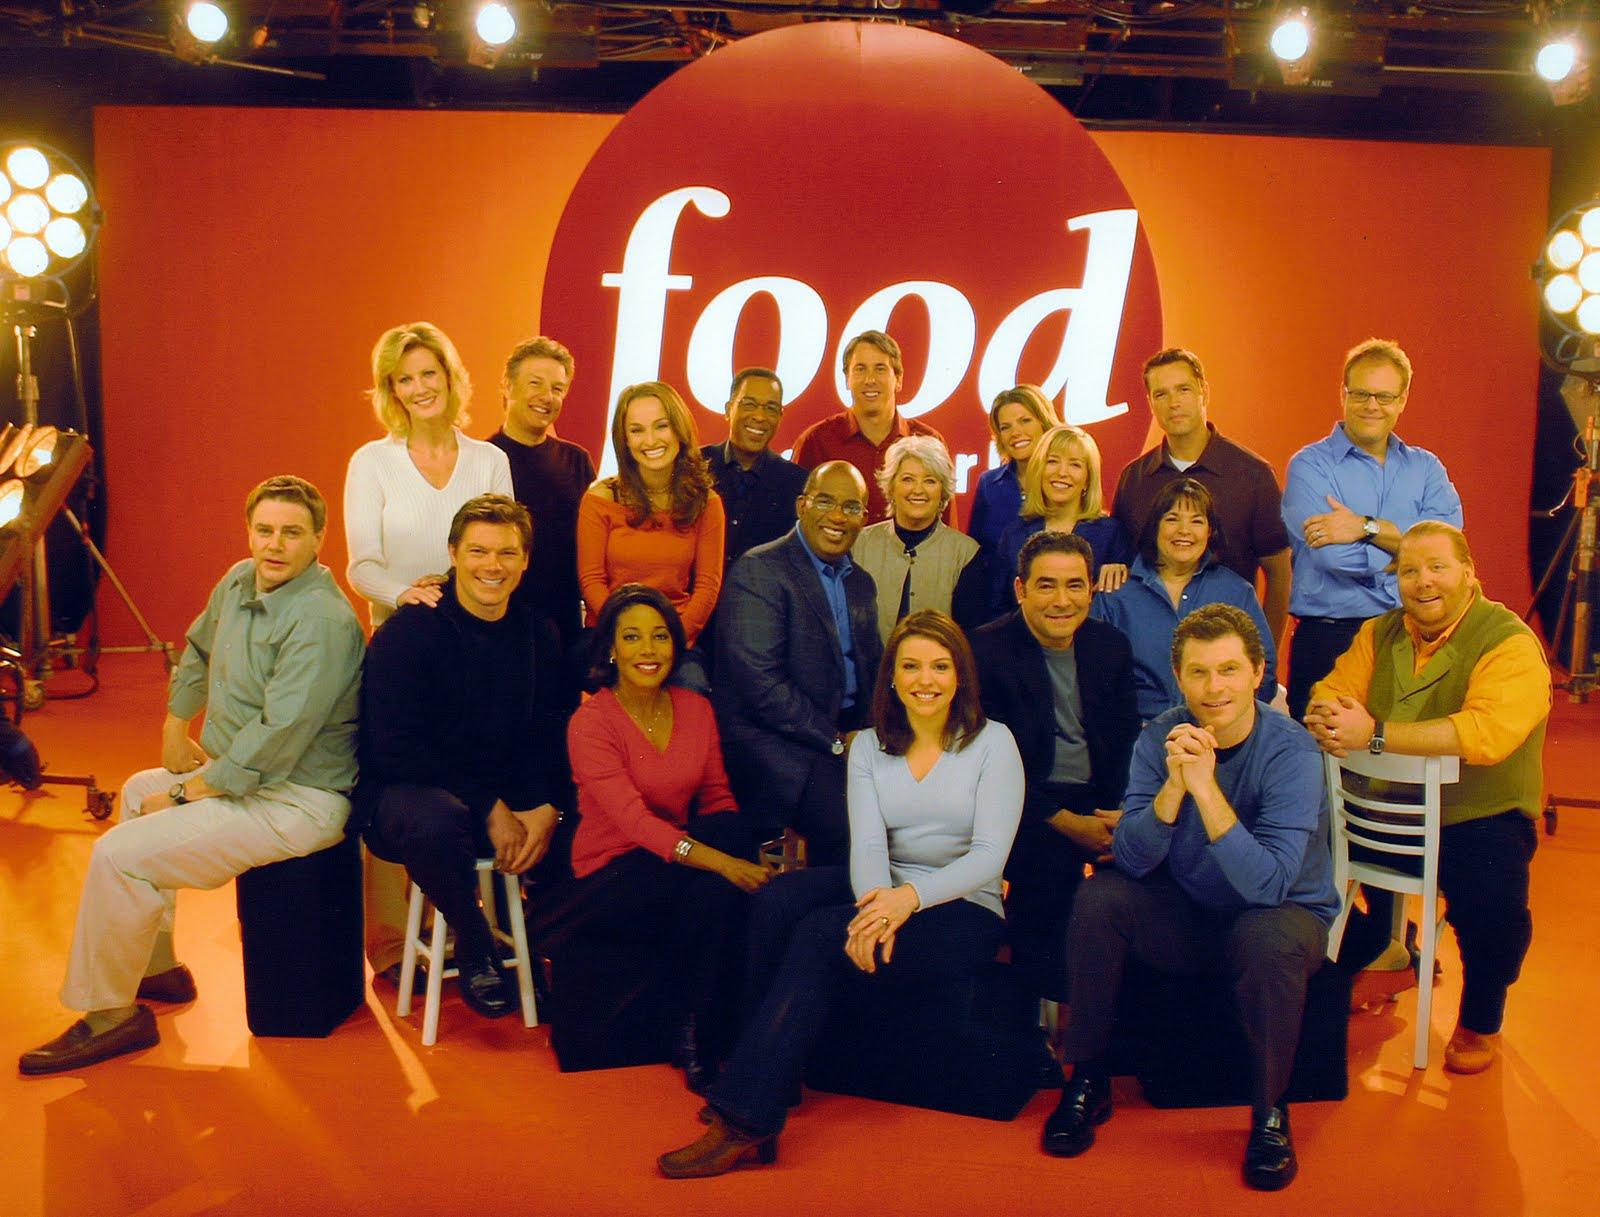 Cooking for One: Food Network Fridays: Giada De Laurentiis!